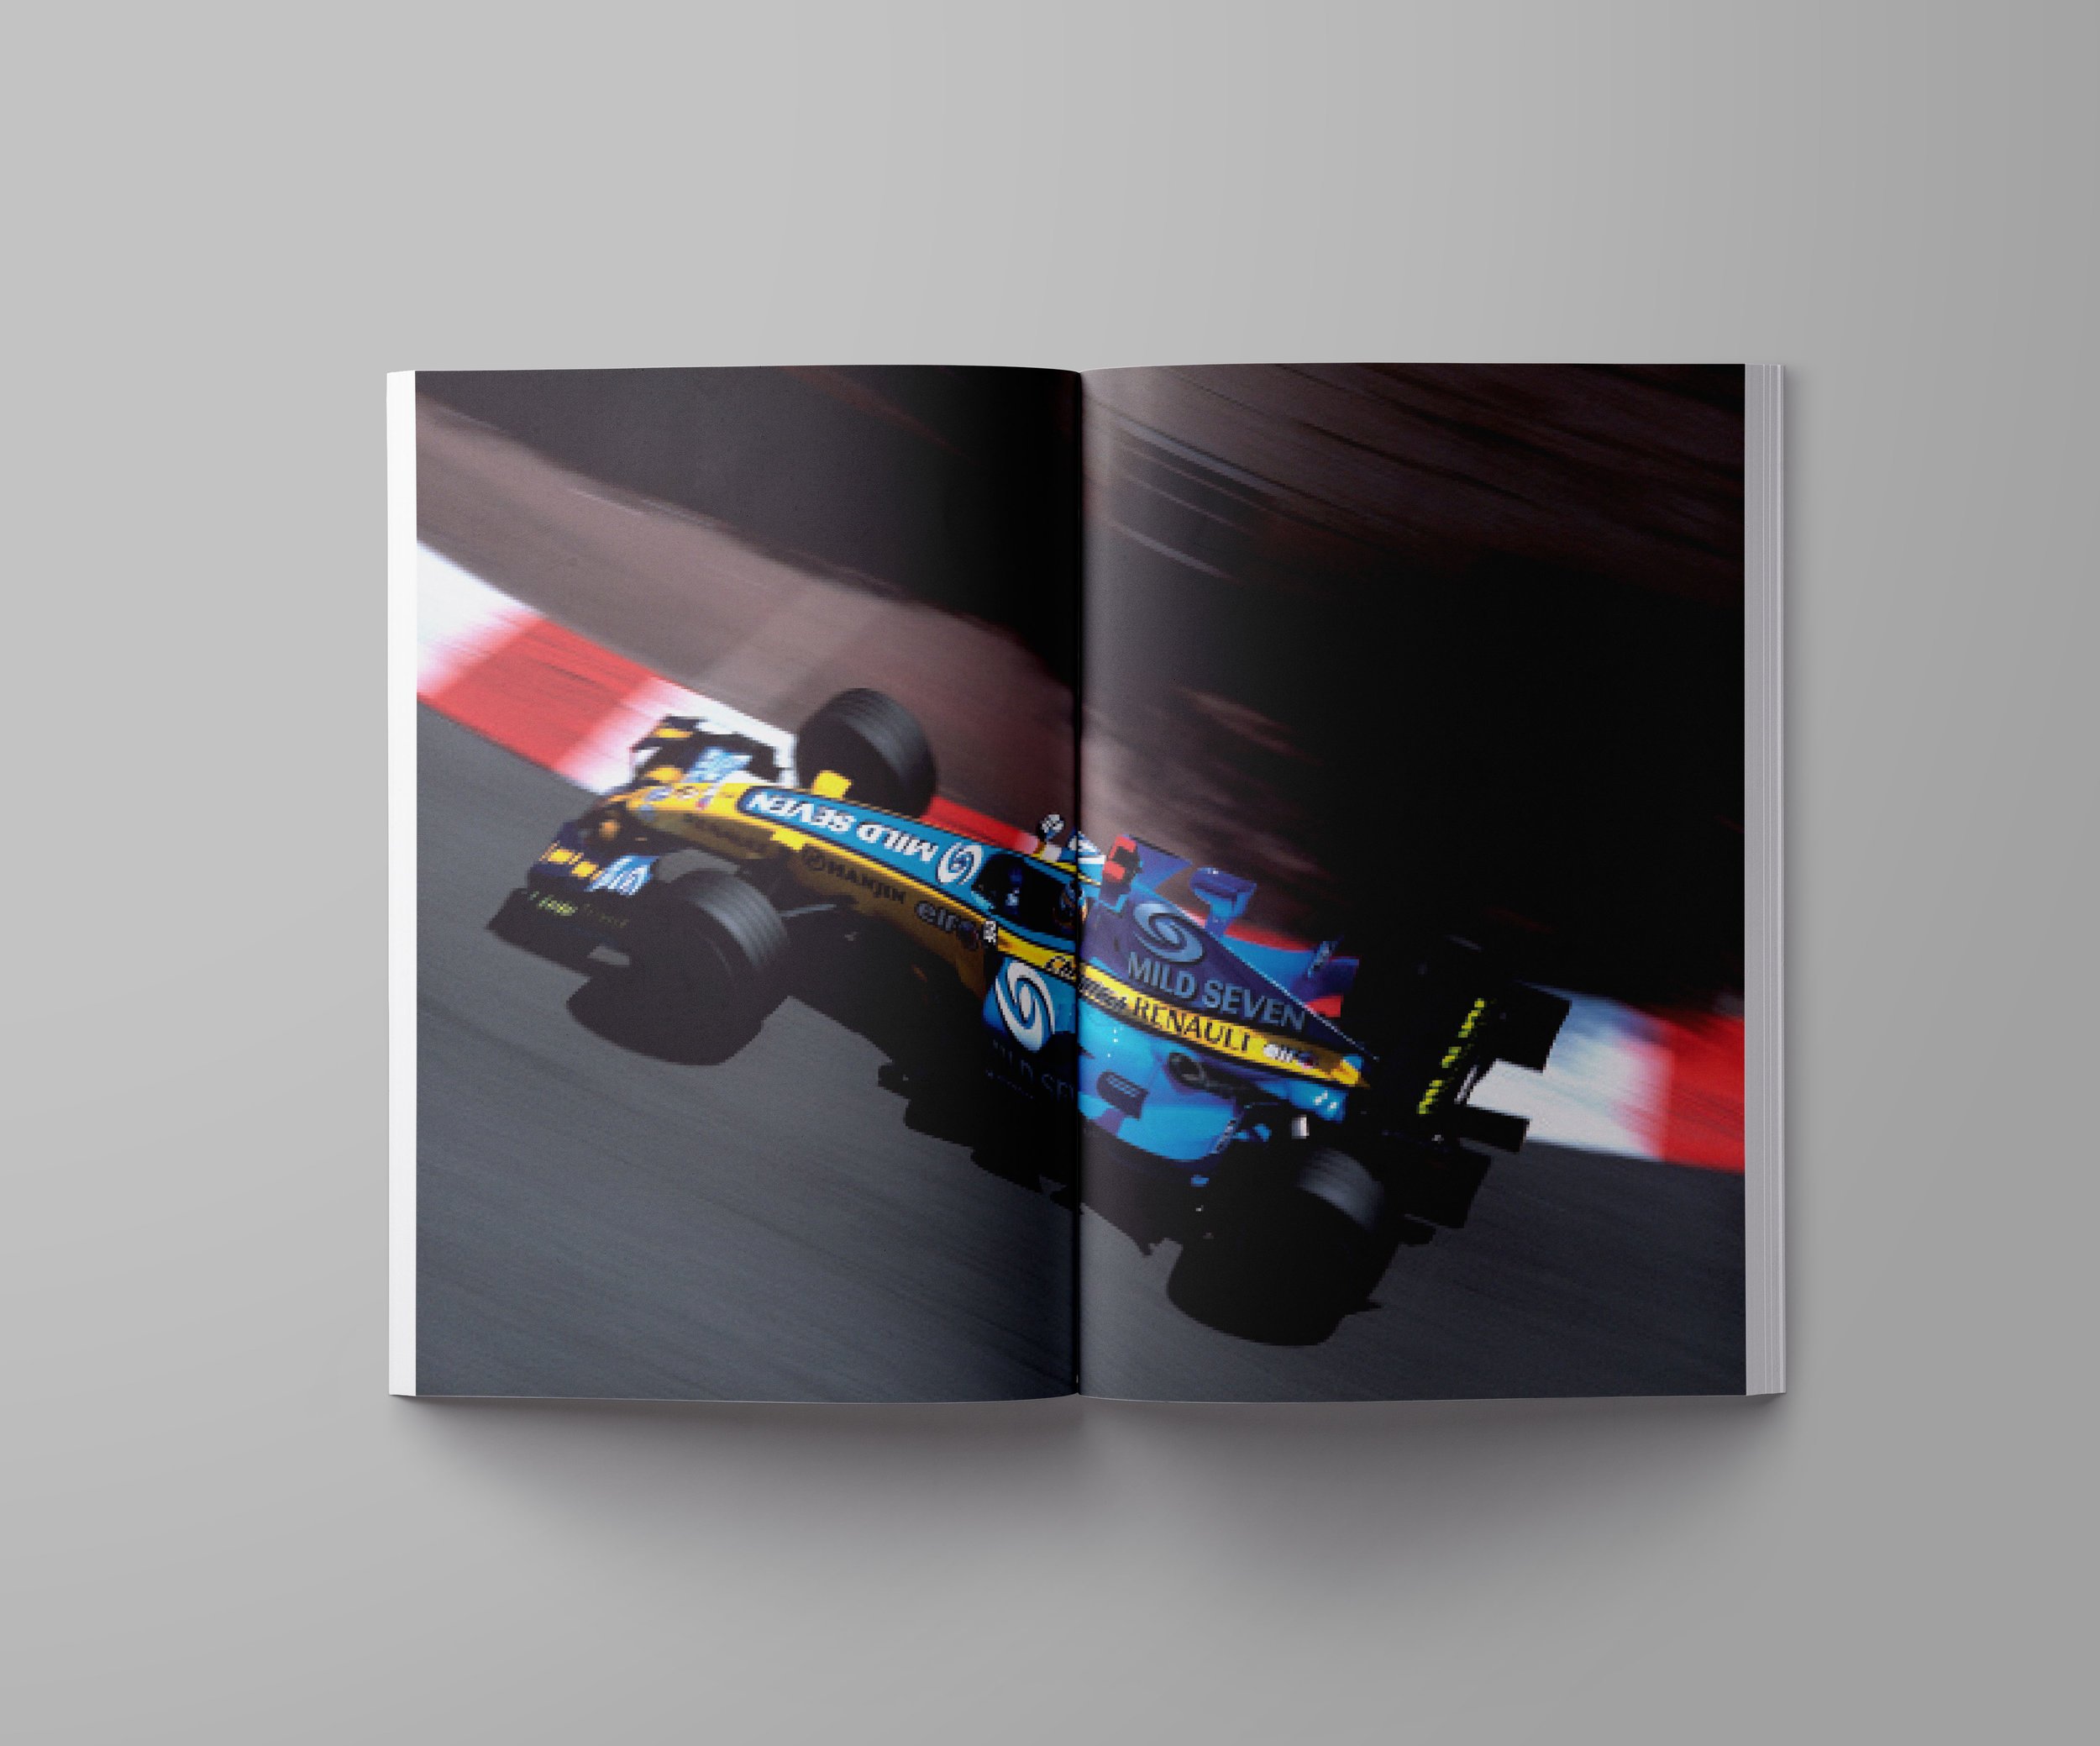 Magazine-USLetter-A4-Mockup-Template-w-f1-02.jpg